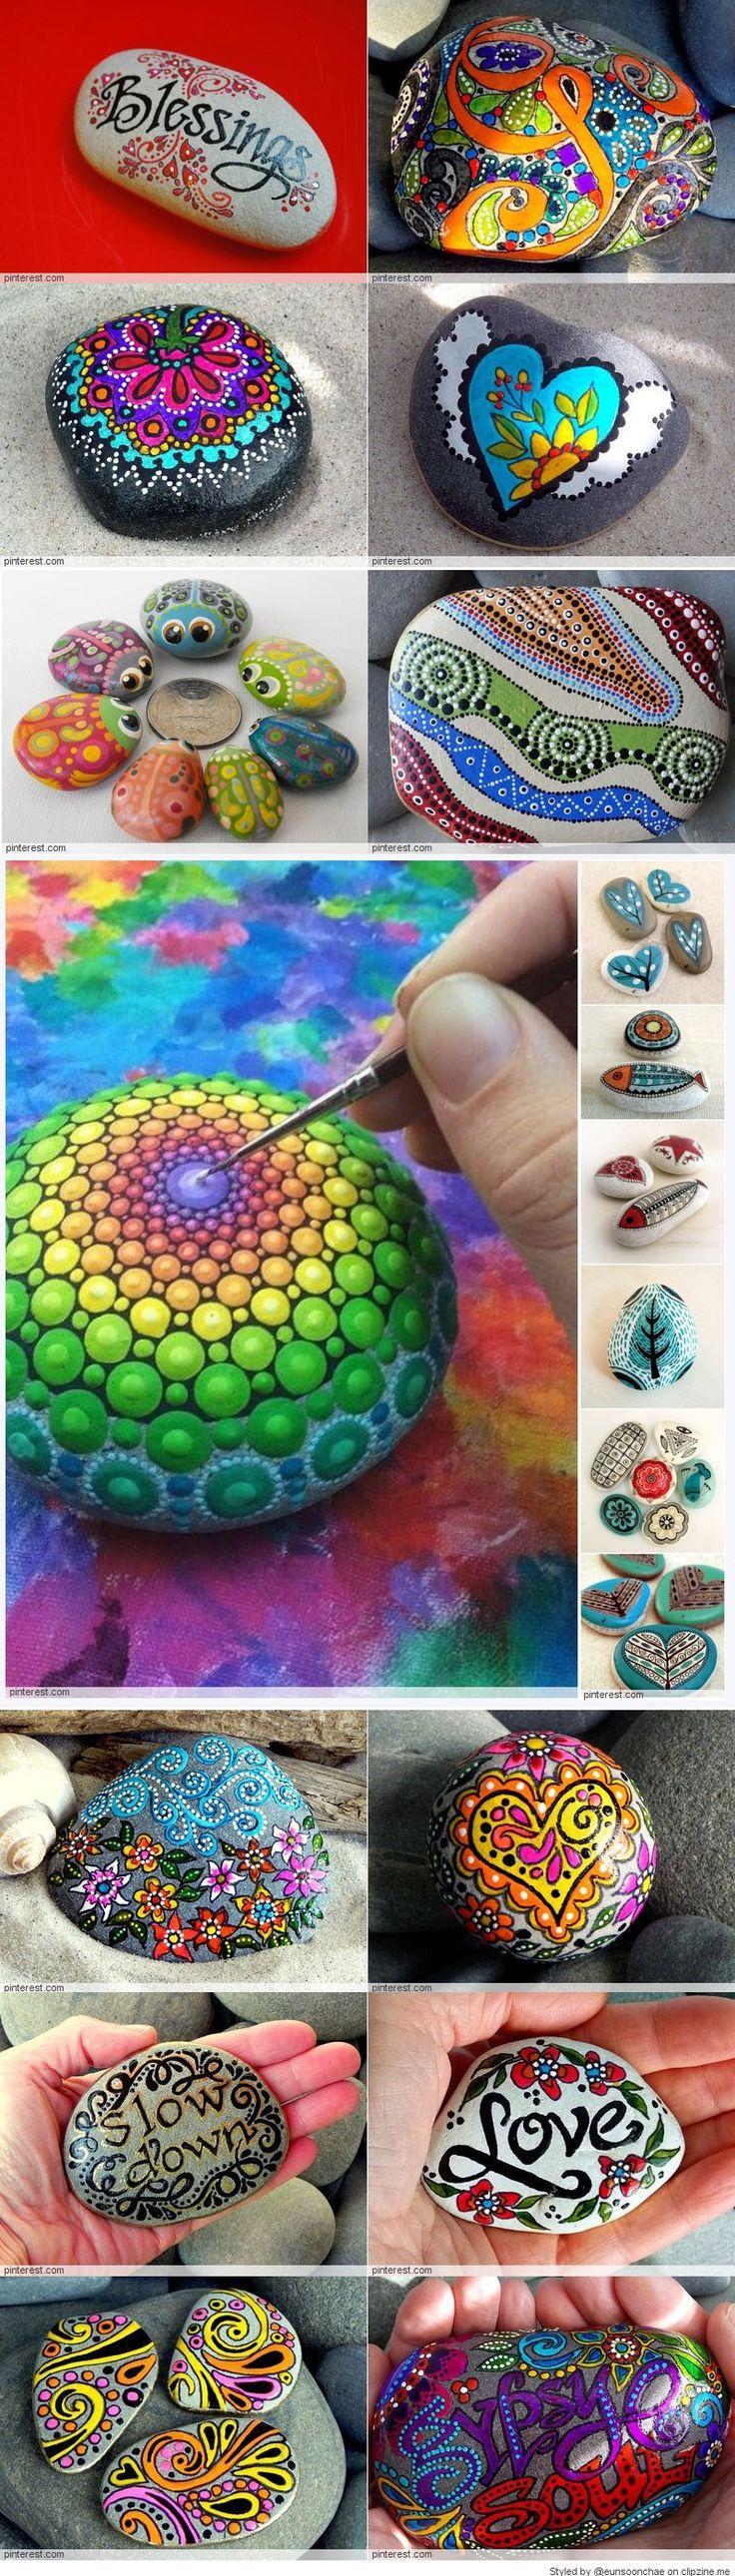 139 best Mandala design images on Pinterest | Painted pebbles ...